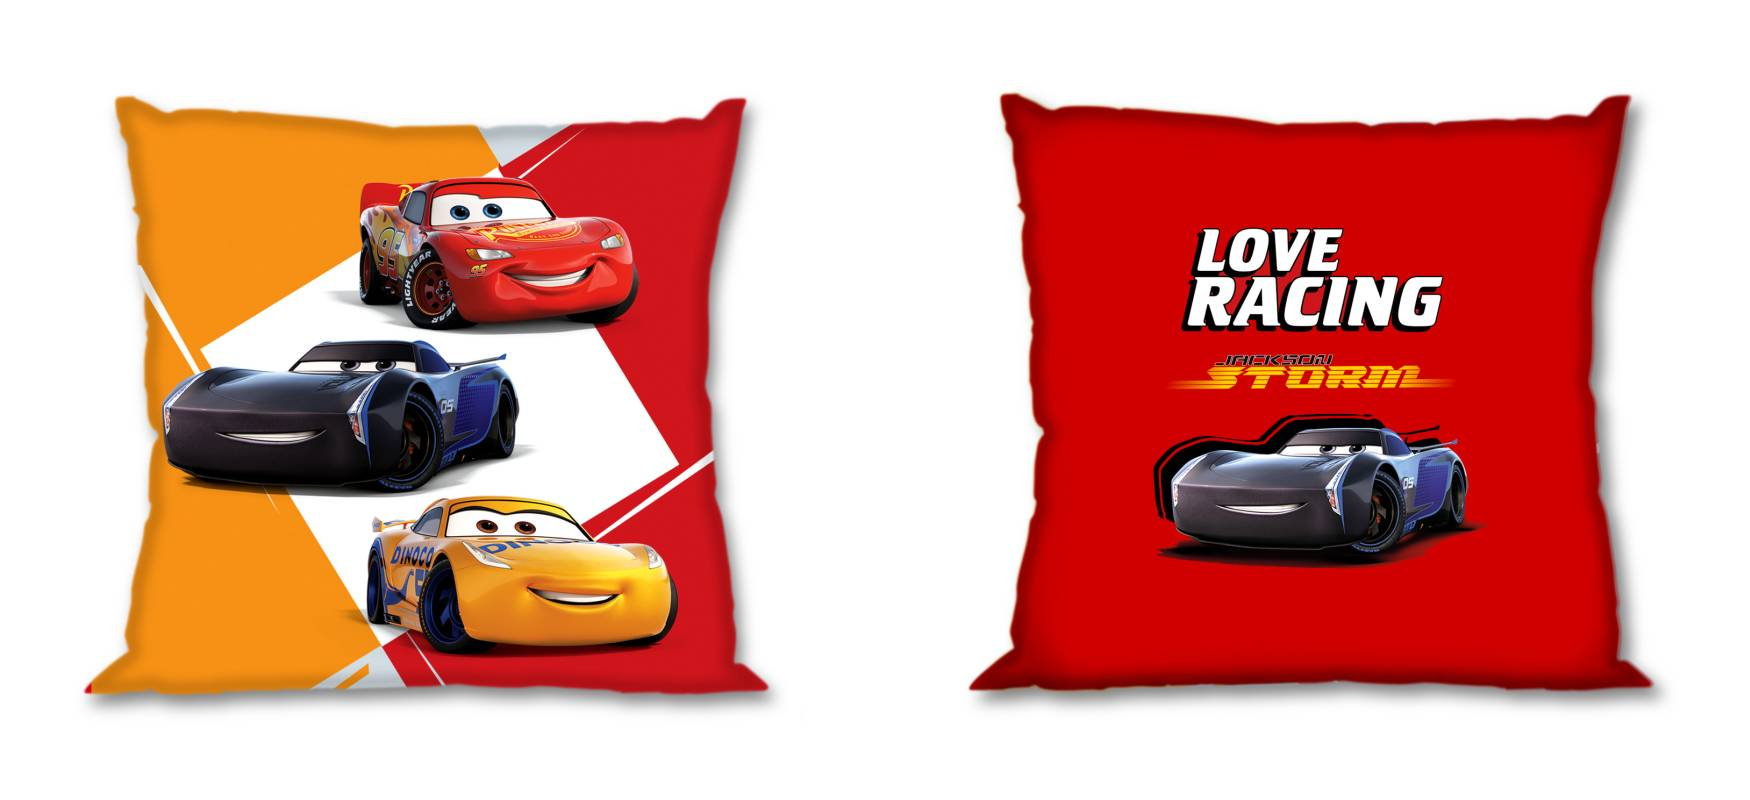 FARO Povlak na polštářek Cars Love Racing  Bavlna, 40/40 cm